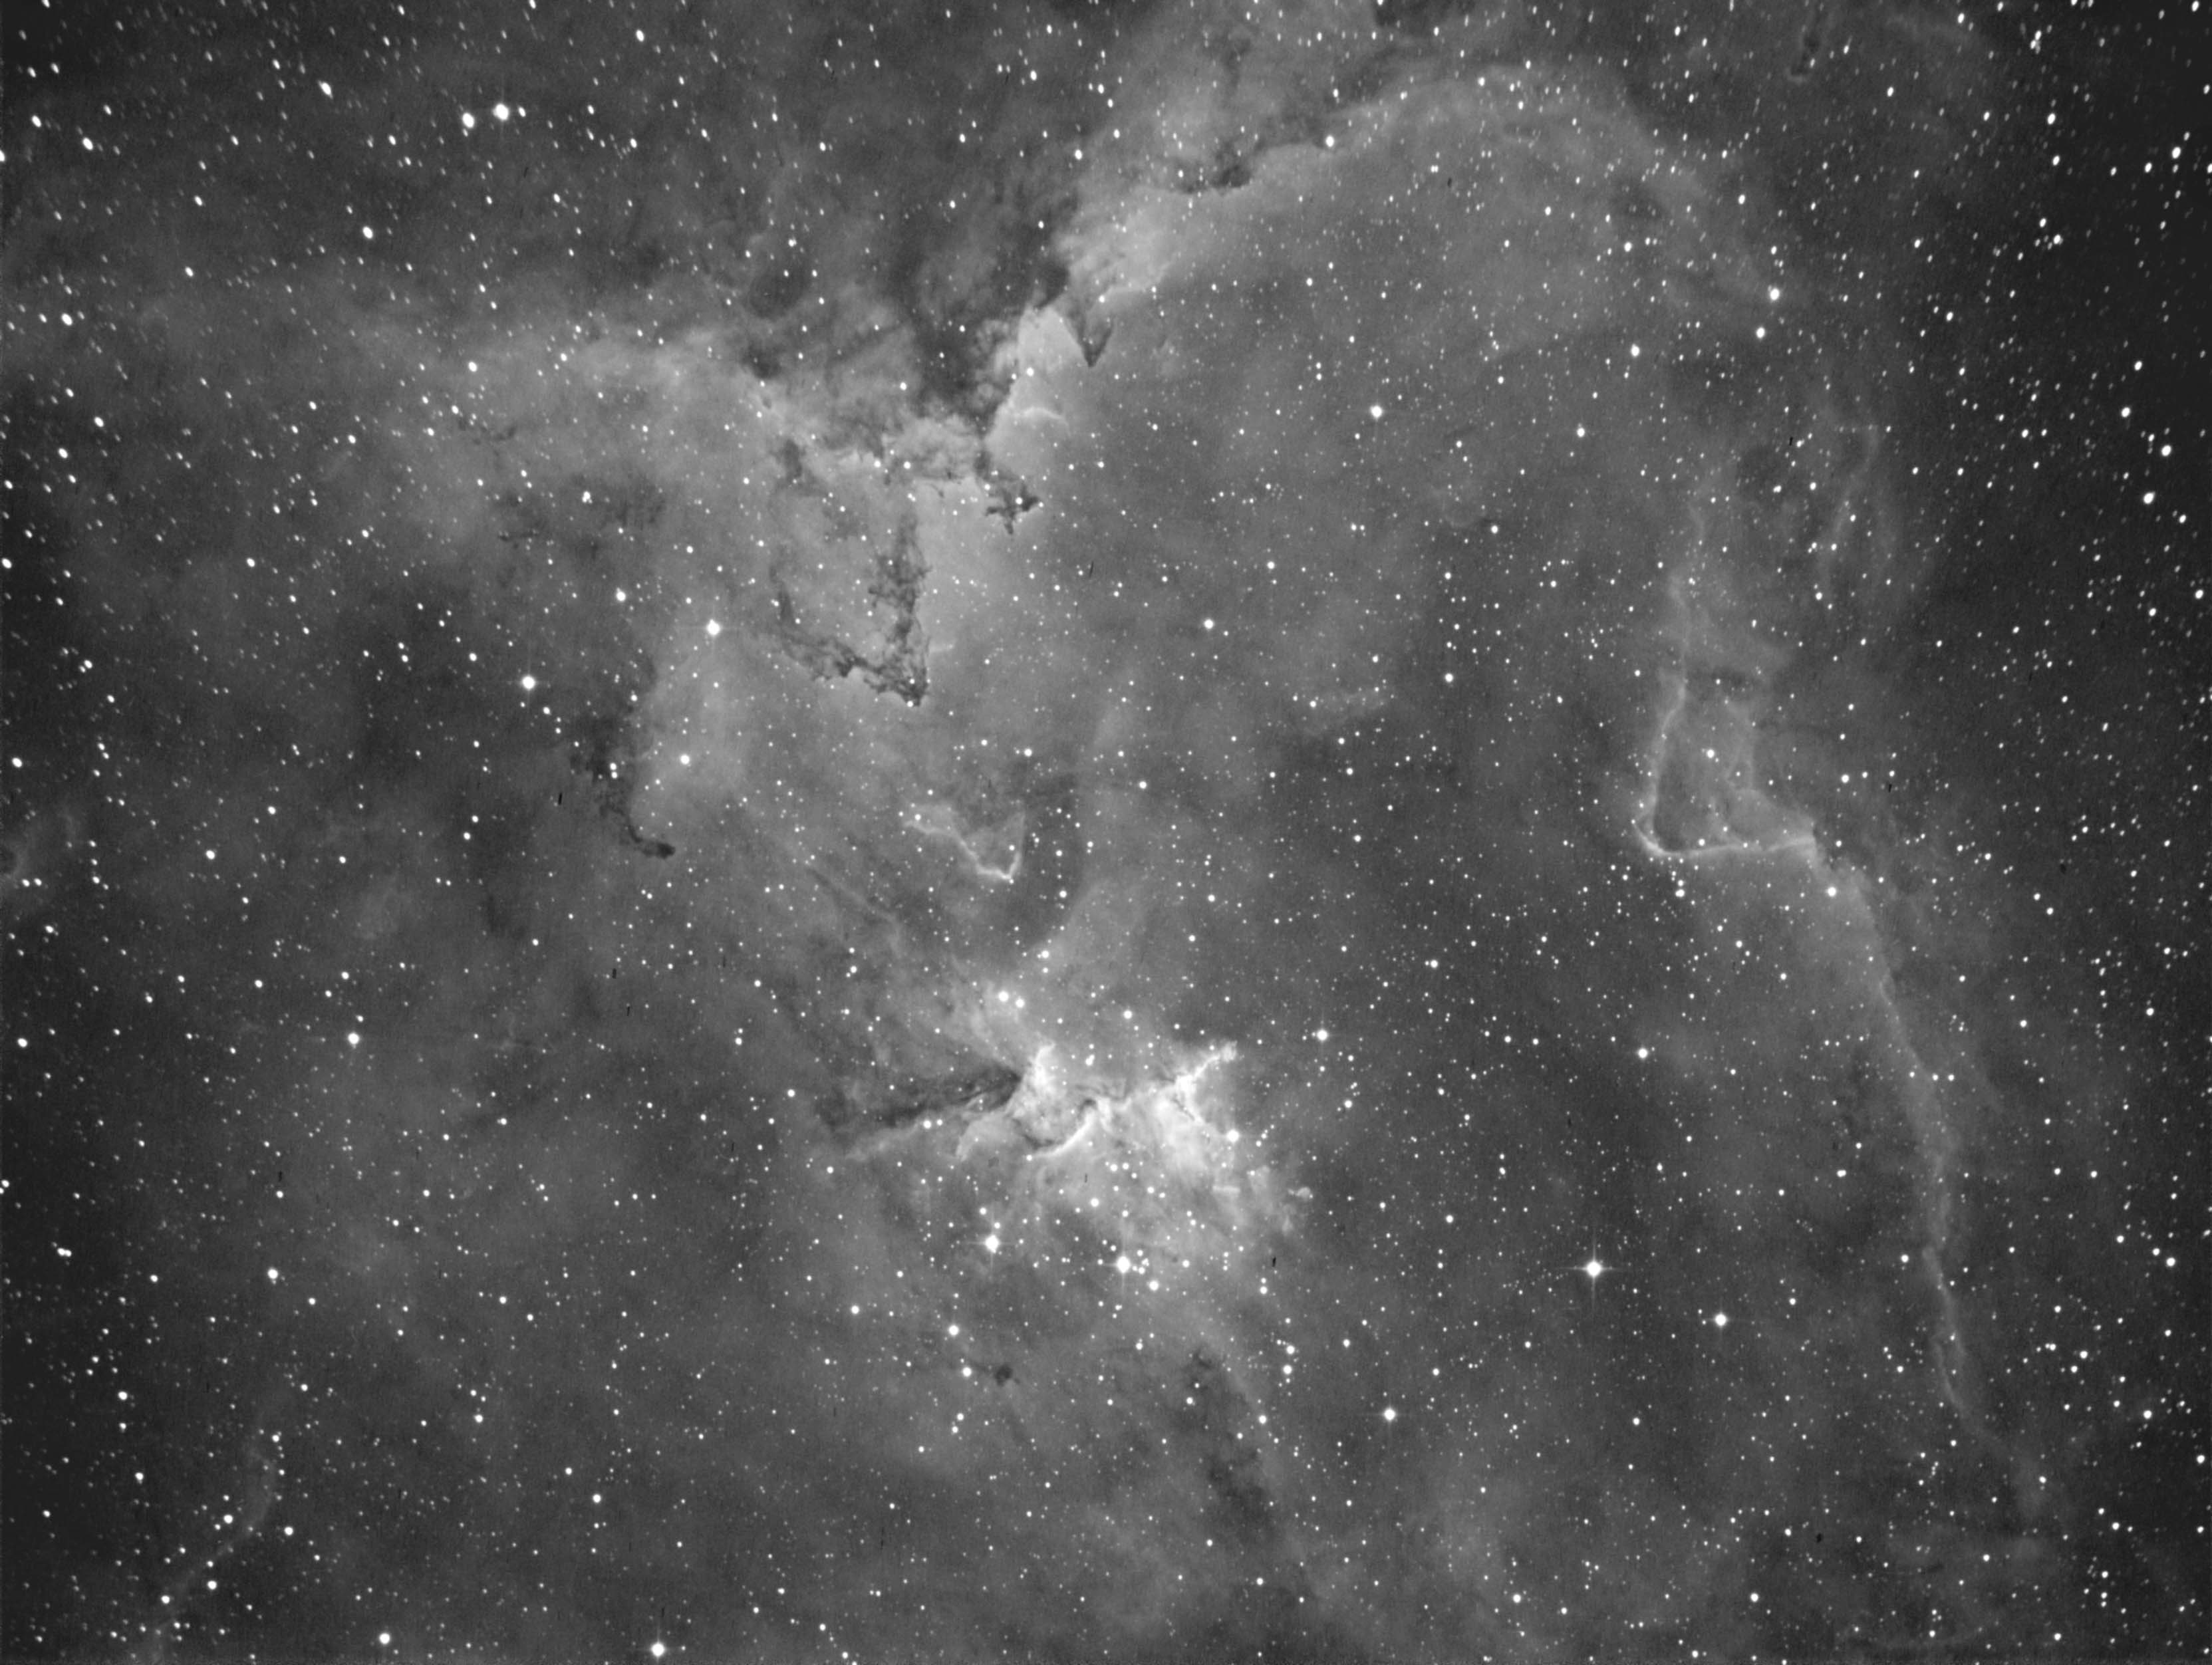 IC 1805 / ハート星雲_c0061727_22151384.jpg